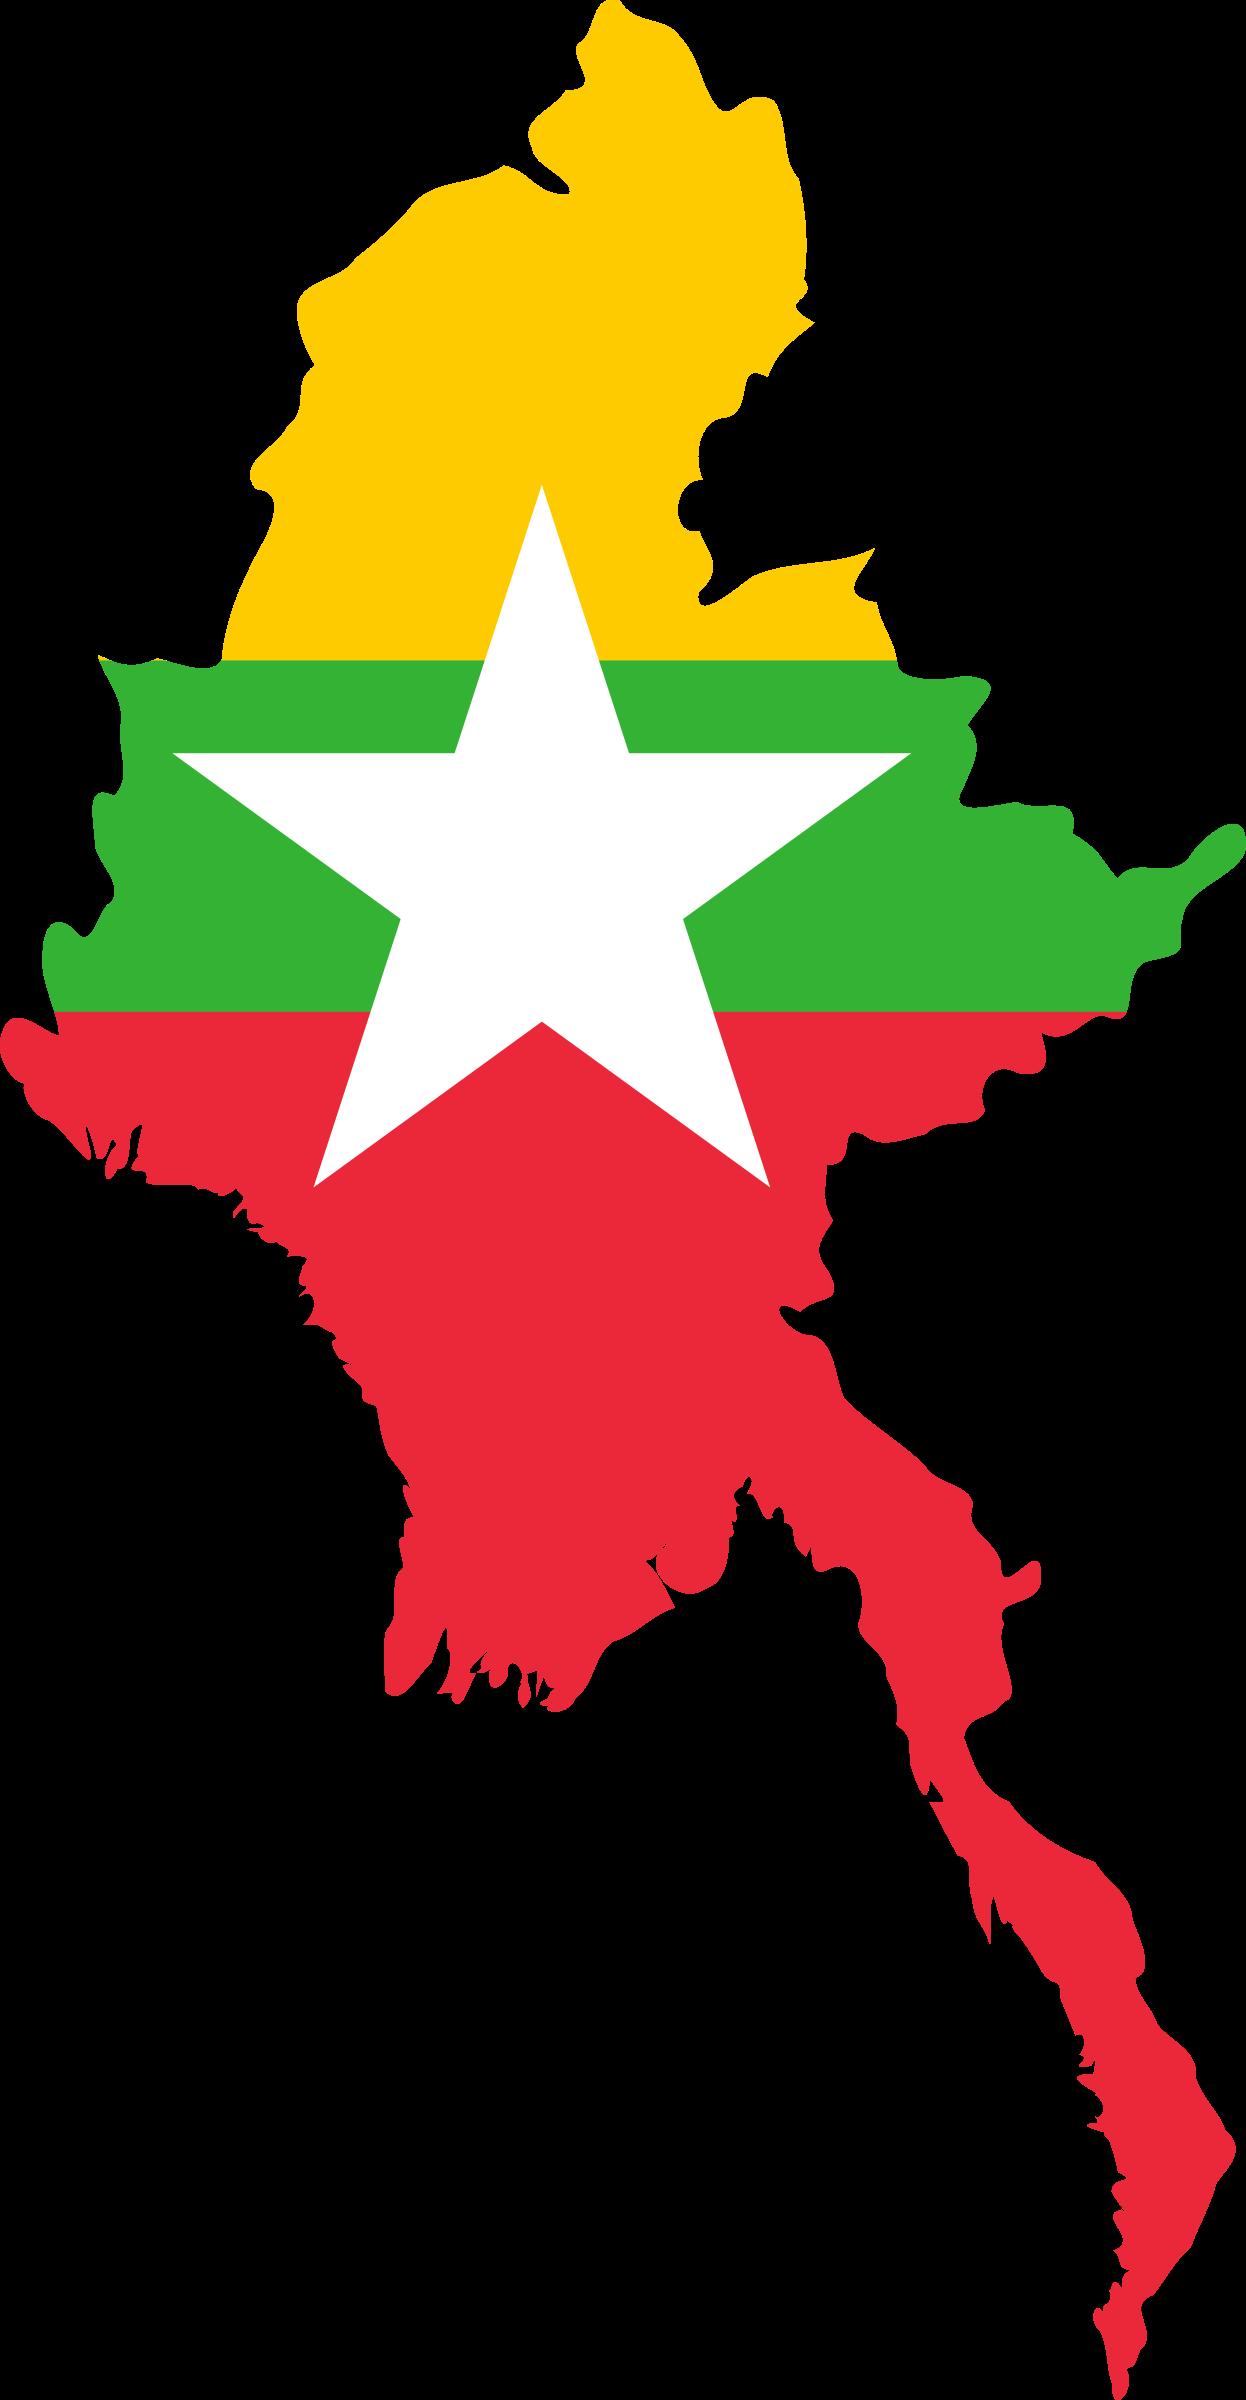 Clipart - Myanmar outline 2